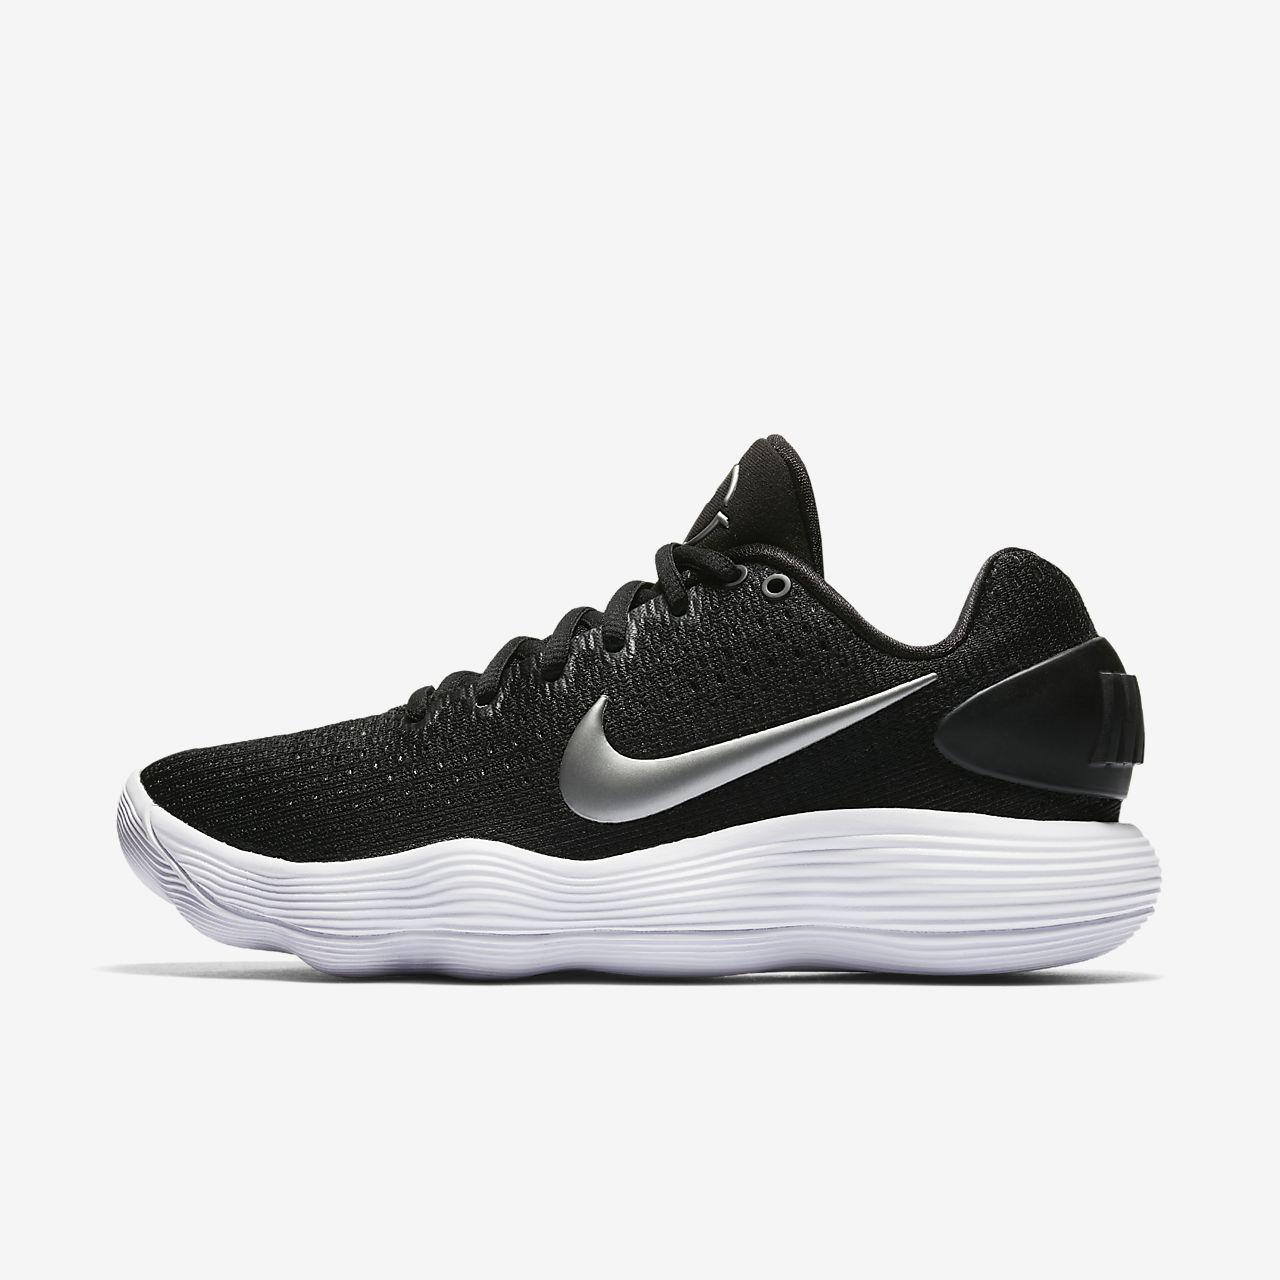 Dunk Faible - Chaussures - Bas-tops Et Baskets Nike fhnbDkAIN